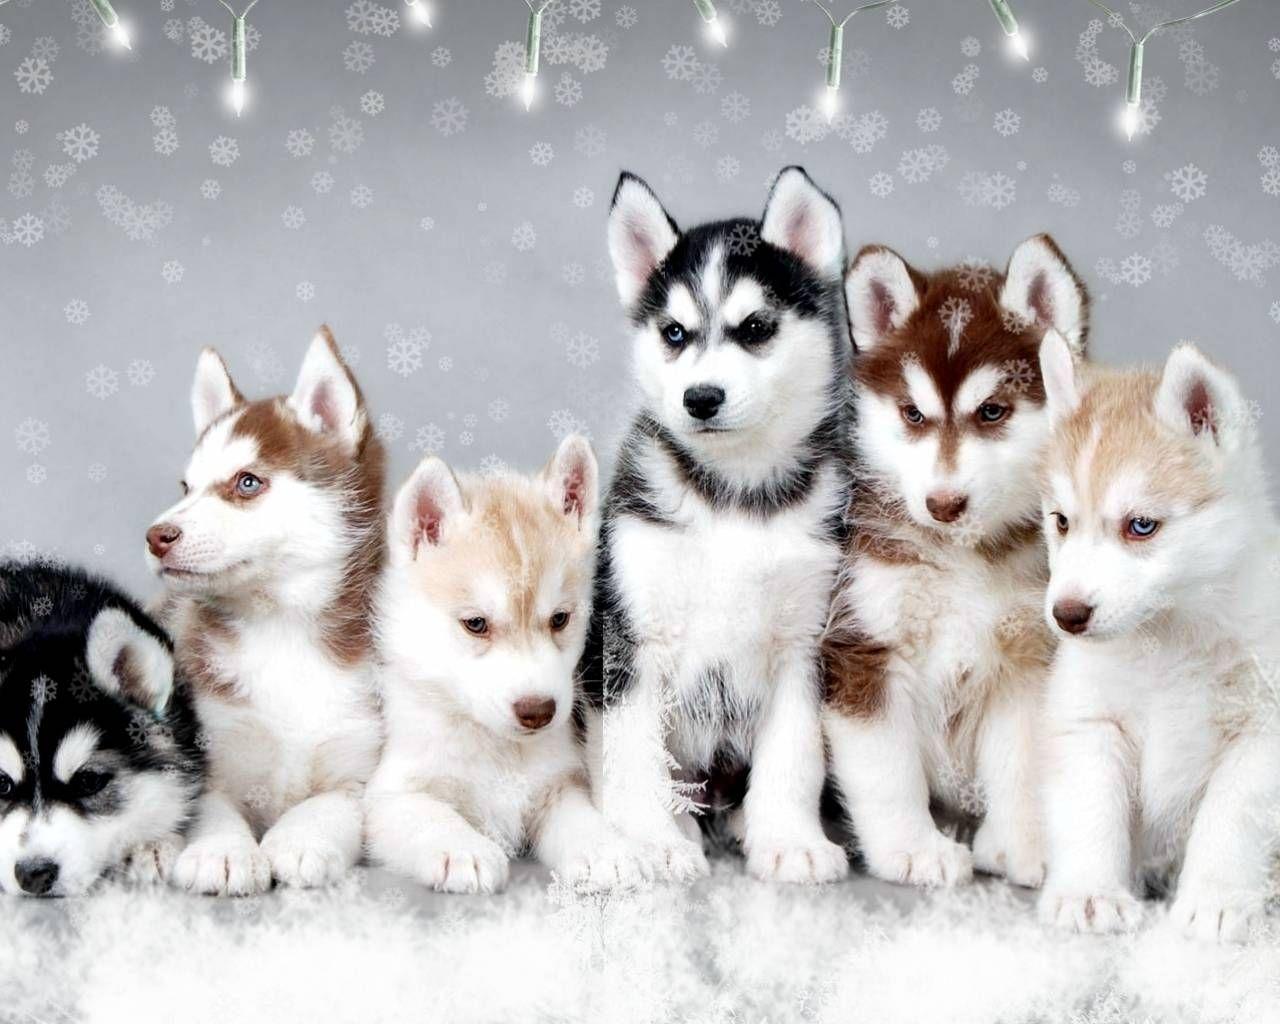 Cute Newborn Husky Puppies Snow Dogs Cute Snow Huskies